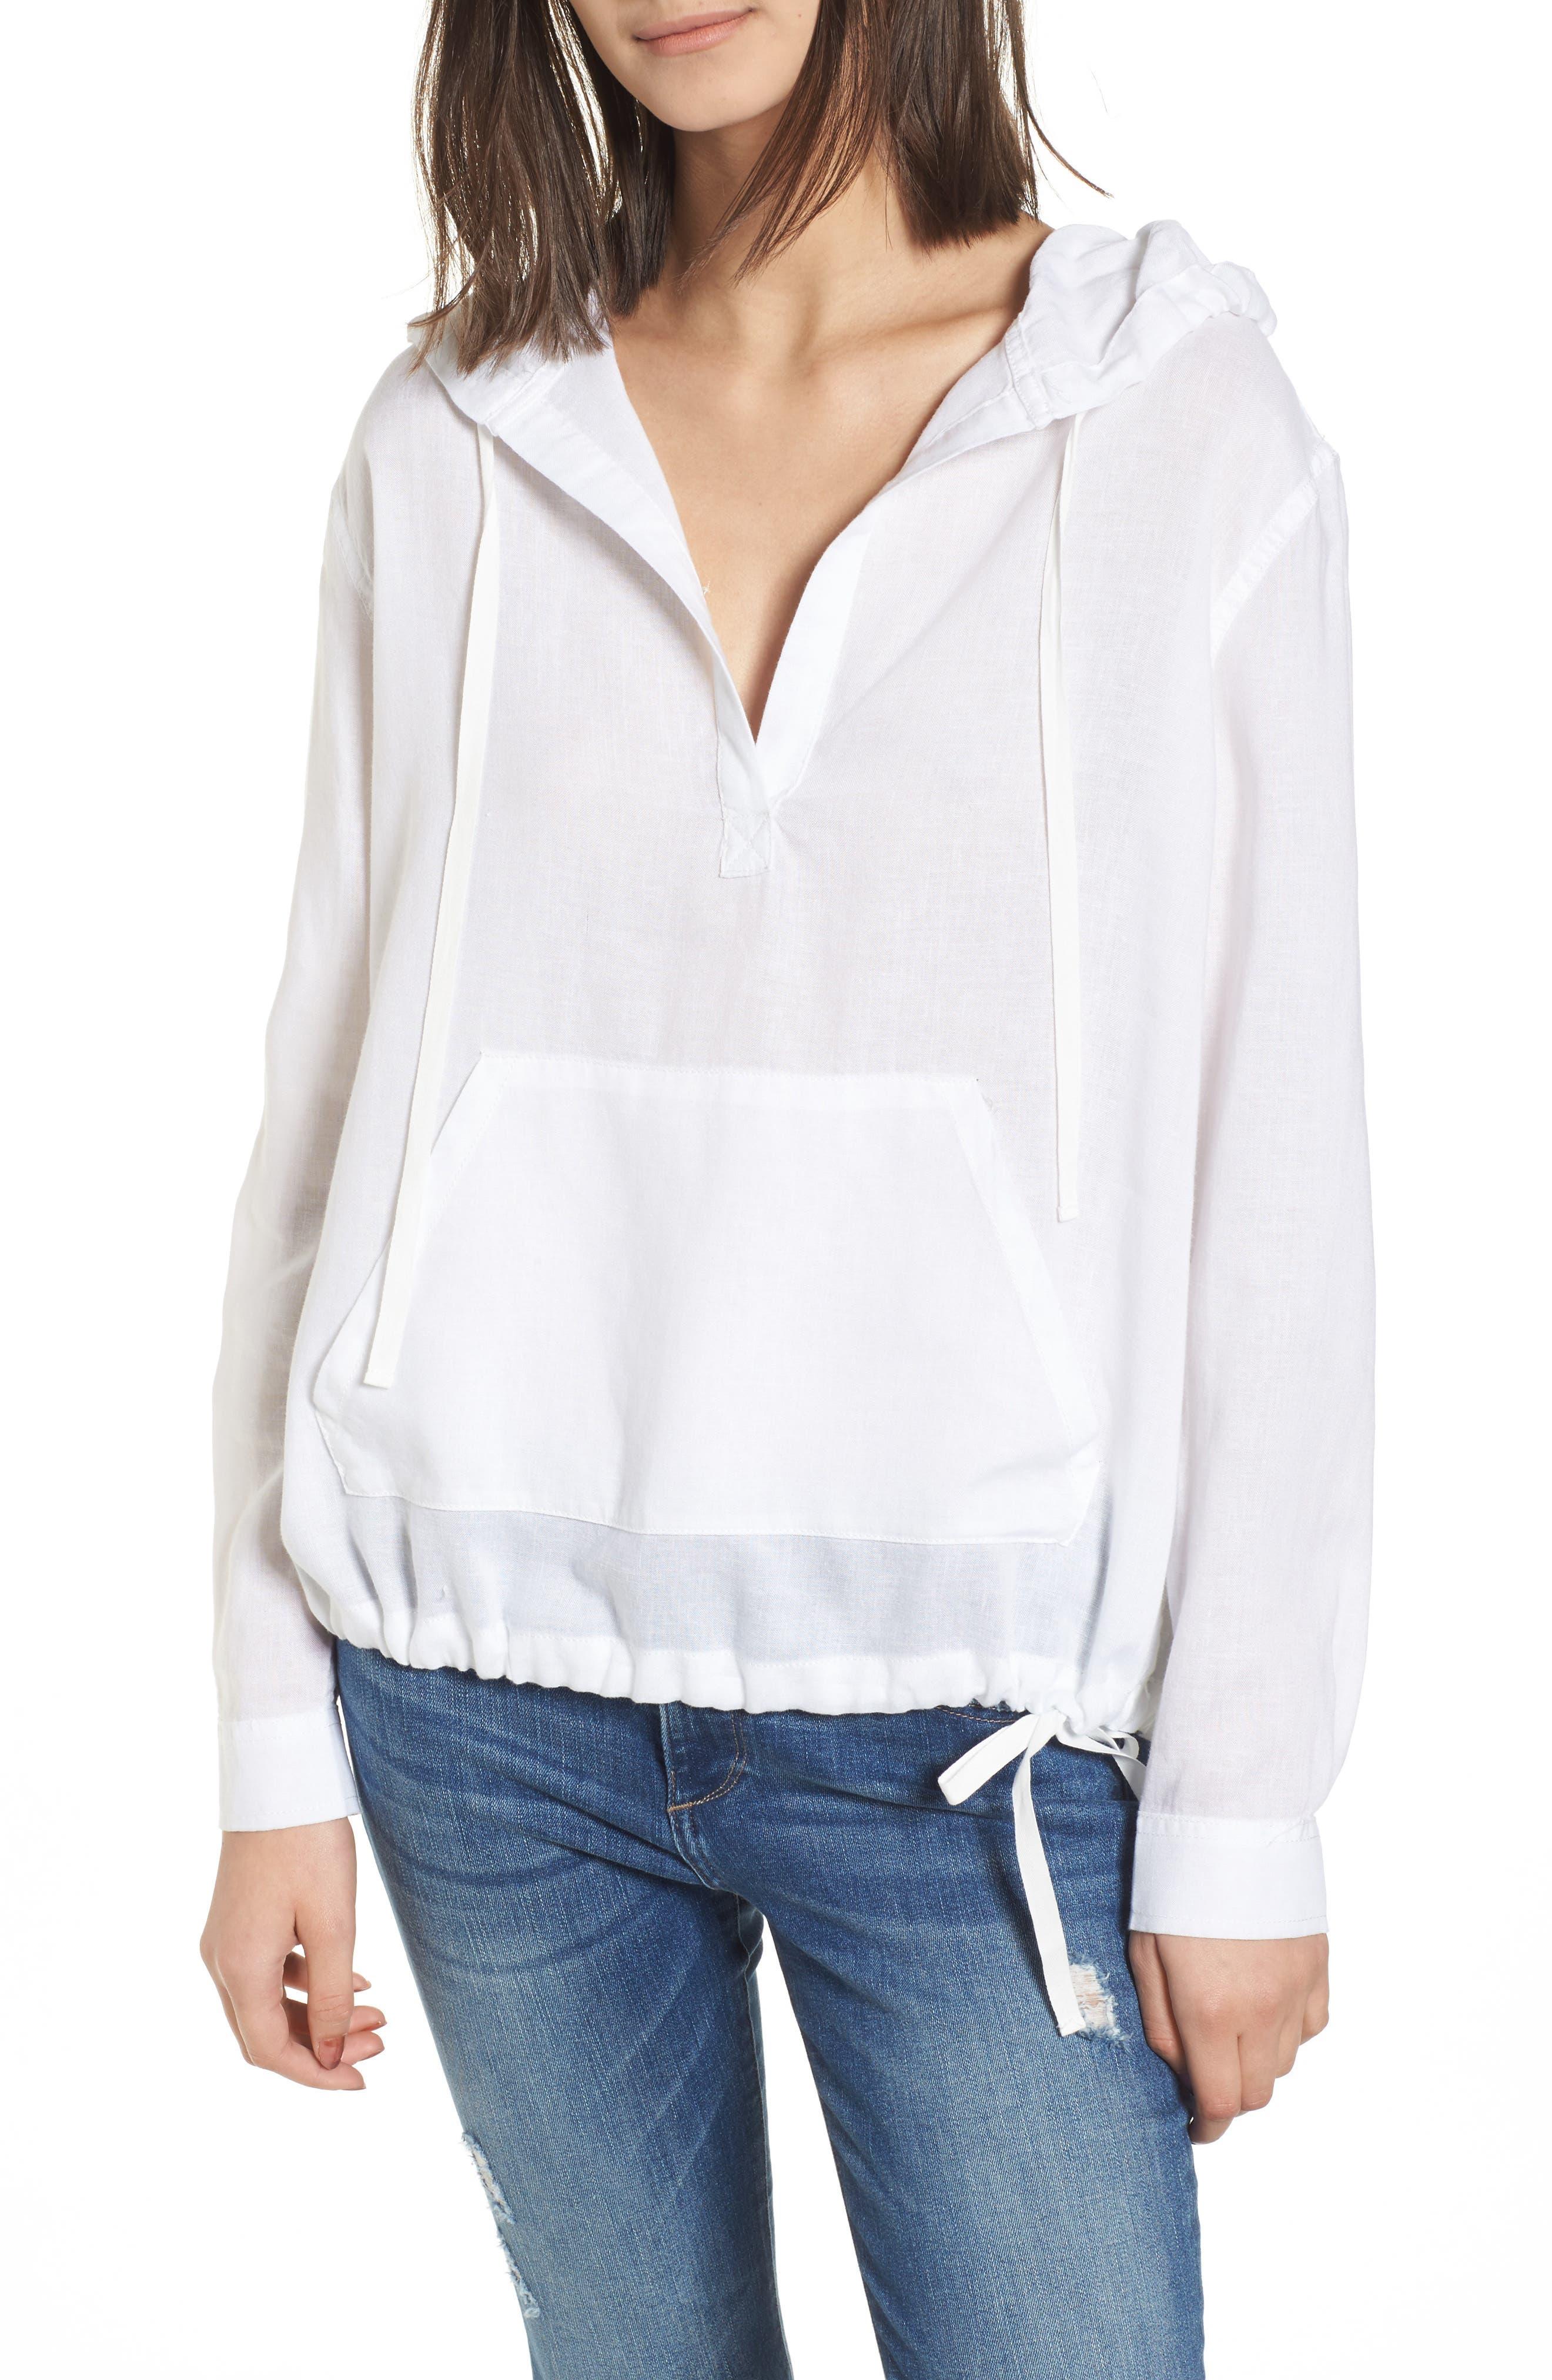 Greenport Hoodie,                         Main,                         color, White